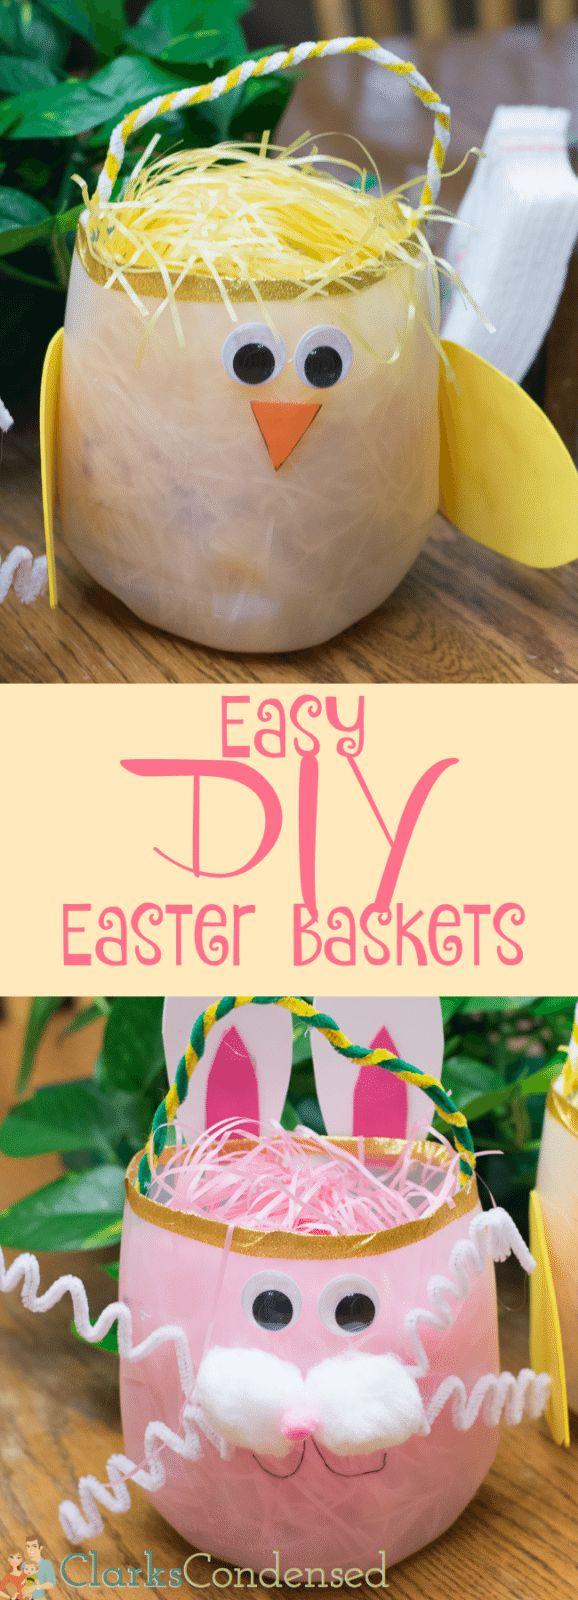 Best 25 easter baskets ideas on pinterest easter easter best 25 easter baskets ideas on pinterest easter easter baskets craft and easter ideas negle Images